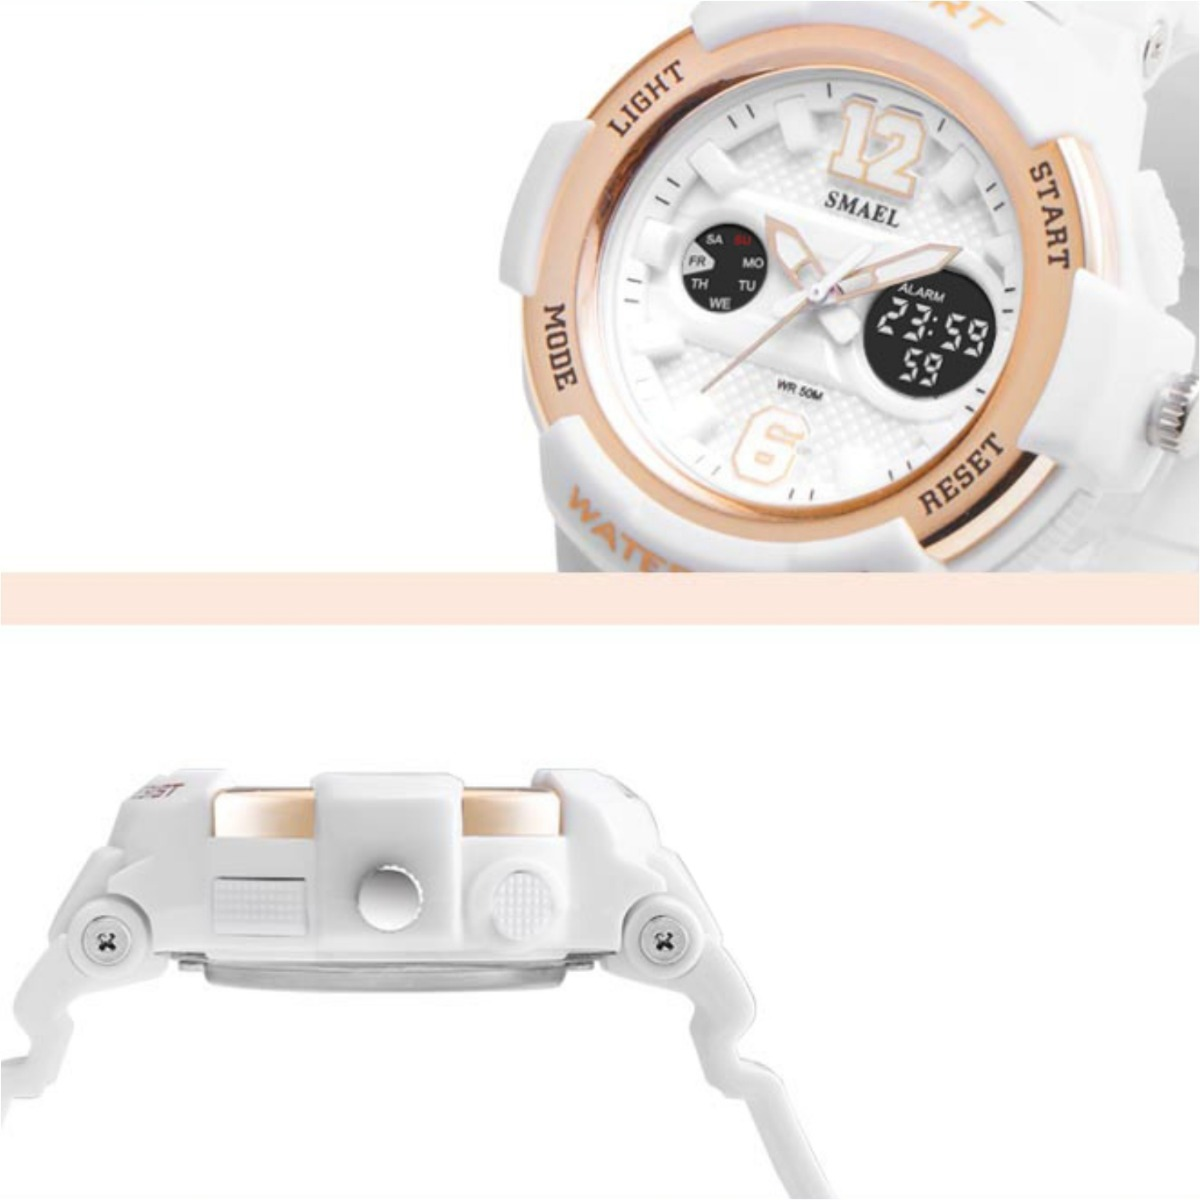 c3db6a6ba07 relógio feminino esportivo top 50 metros - menor preço. Carregando zoom.